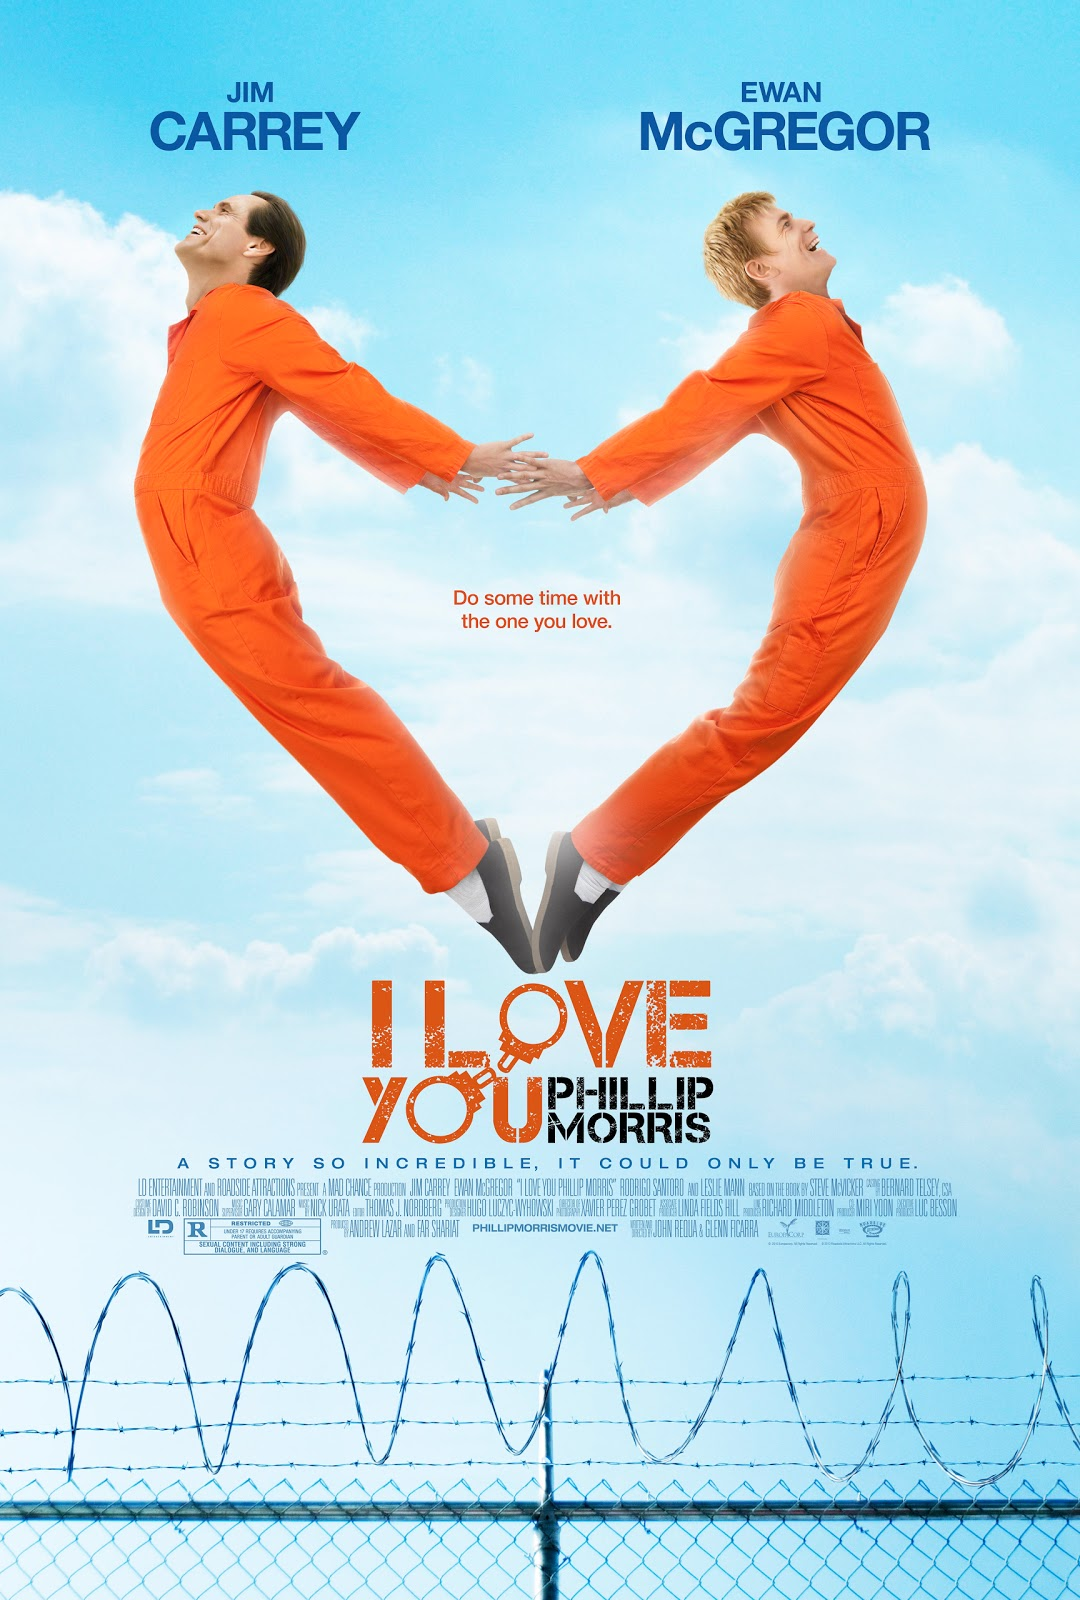 i love you phillip morris movie poster 01 Petite Extreme Mature Pretty Fisting 201107